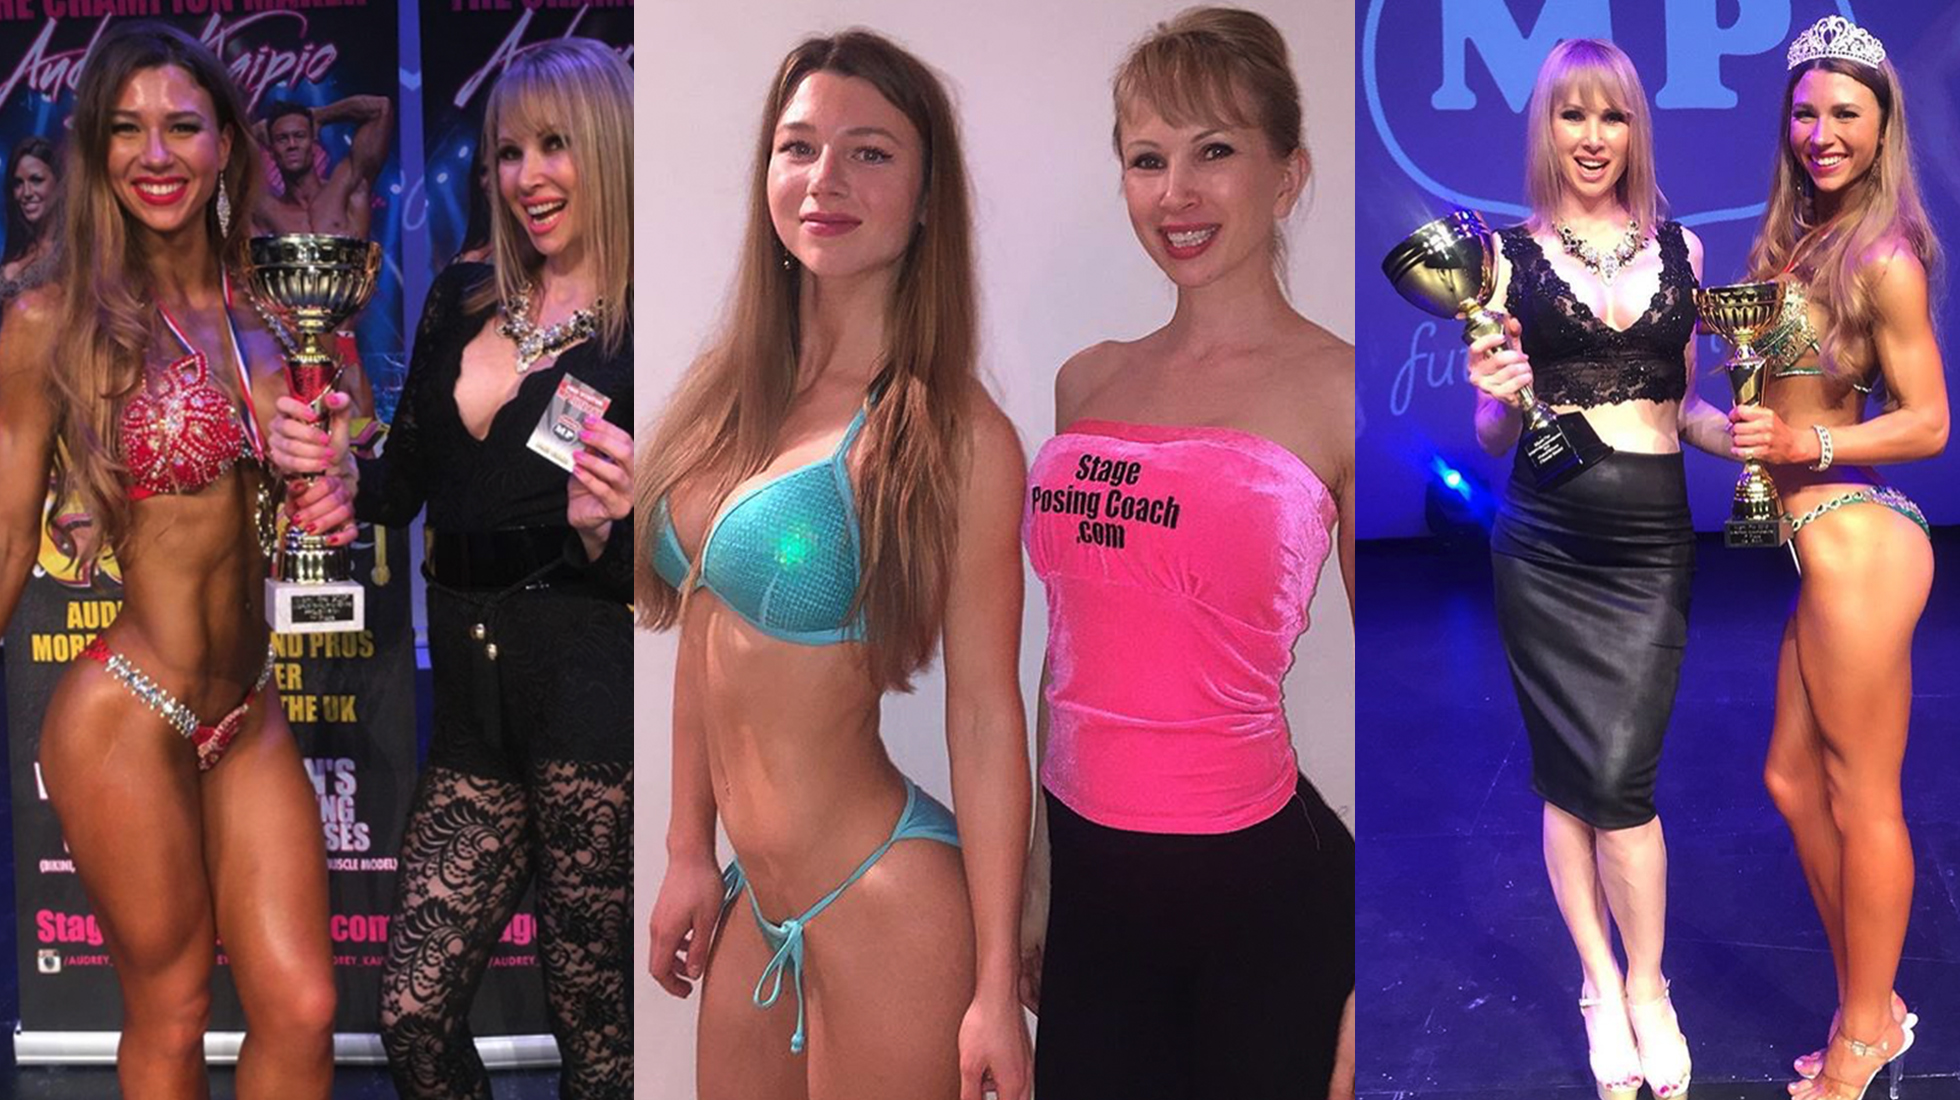 audrey kaipion bikini posing coach anastasiaova anastasia ivanova mppro miami pro wbff ukbff ifbb competitor.jpg